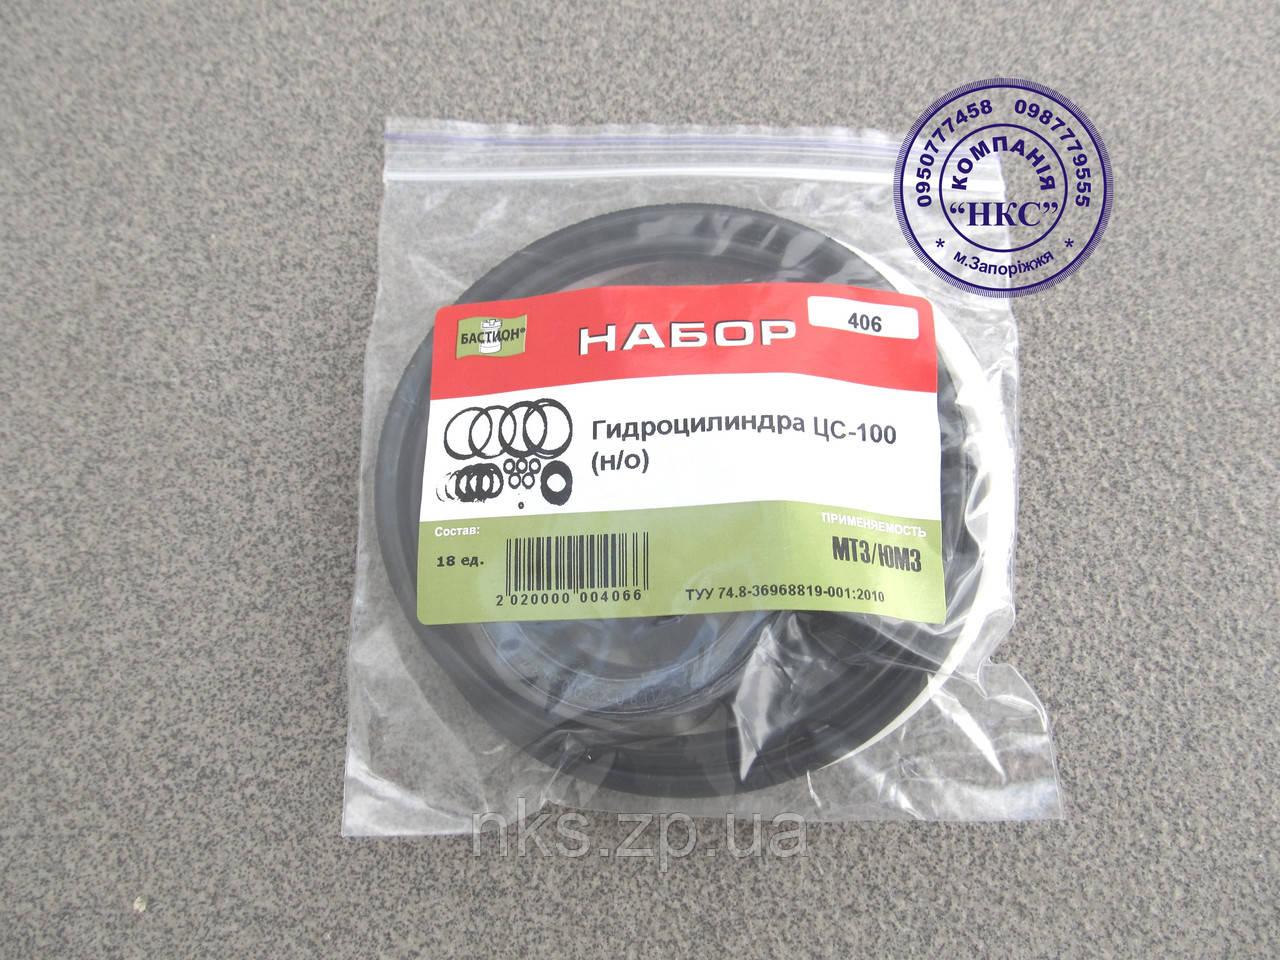 Ремкомплект гидроцилиндра ЦС-100